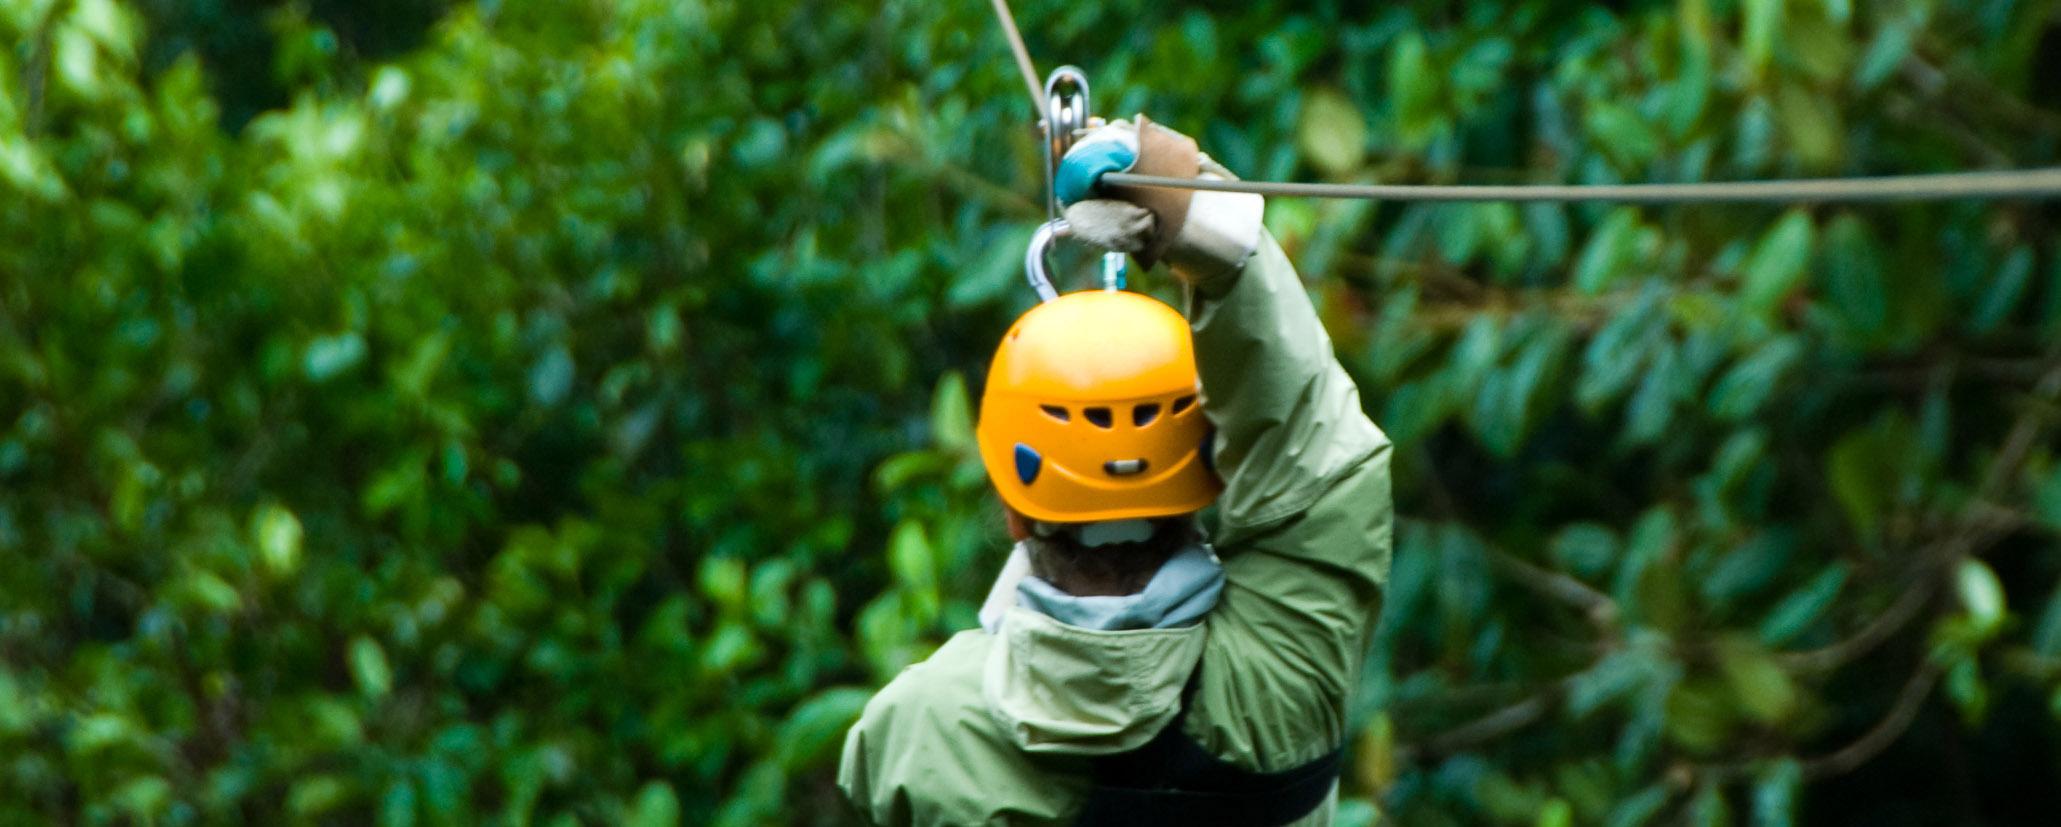 zip-line-canopy-tour-adventure